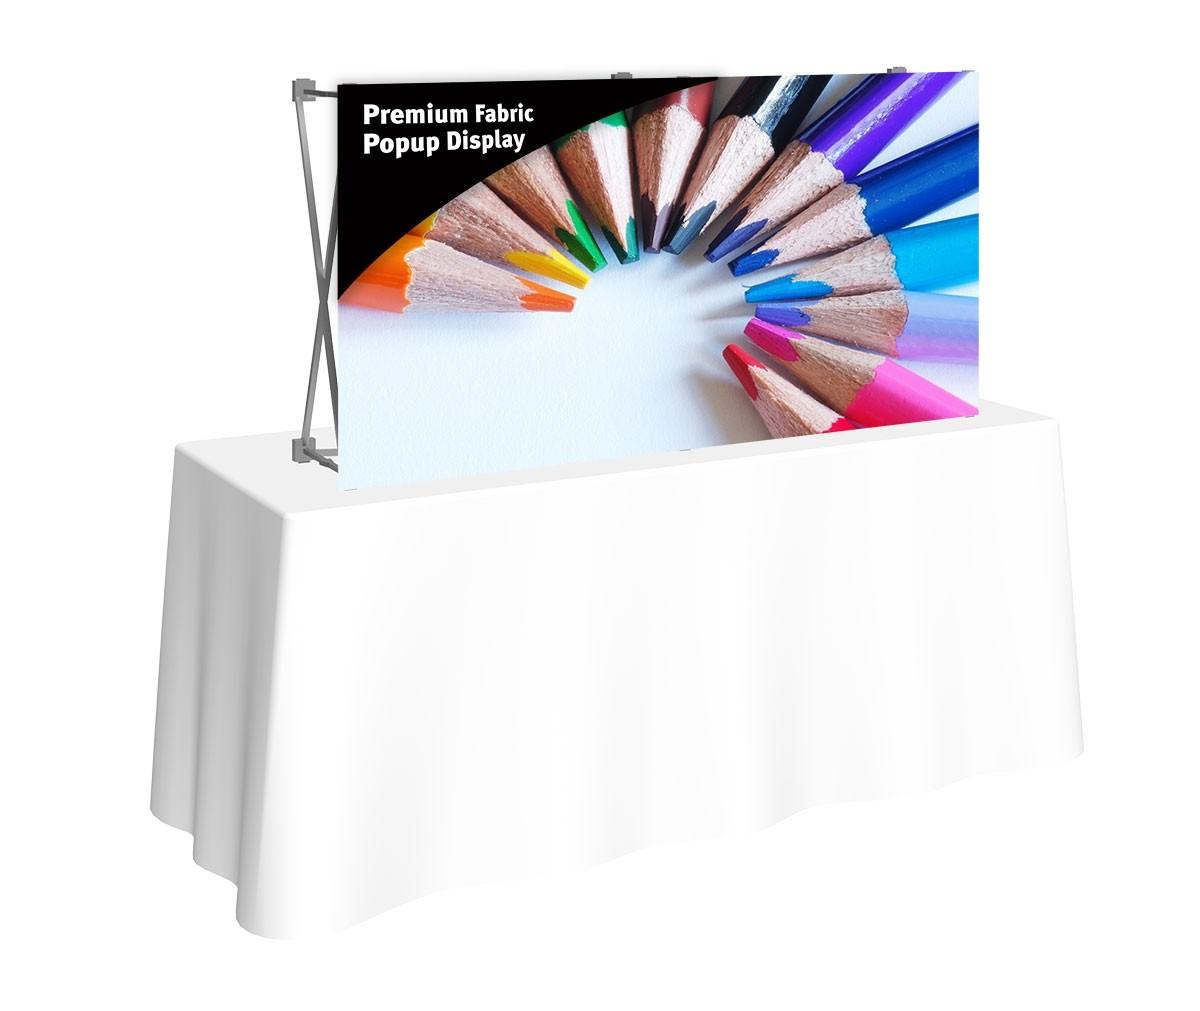 Premium Fabric Popup 5' x 2.5' Table Top Display